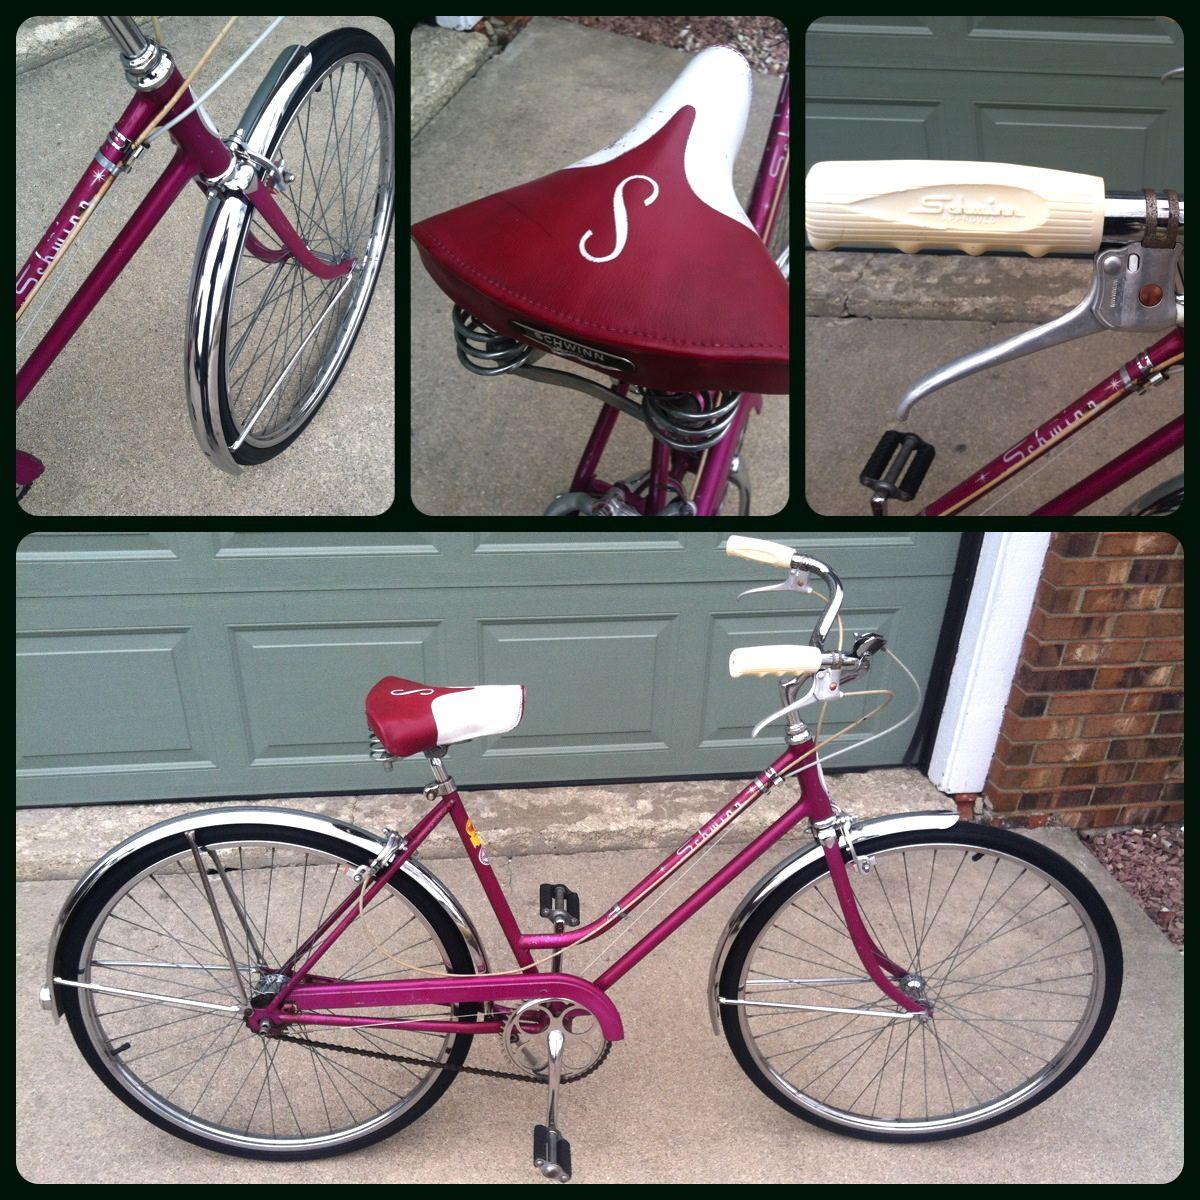 1966 Deluxe Schwinn Breeze 3 Speed Bicycle Purple Vioet Original Vintage Bicycle Schwinn Lightweight Bike